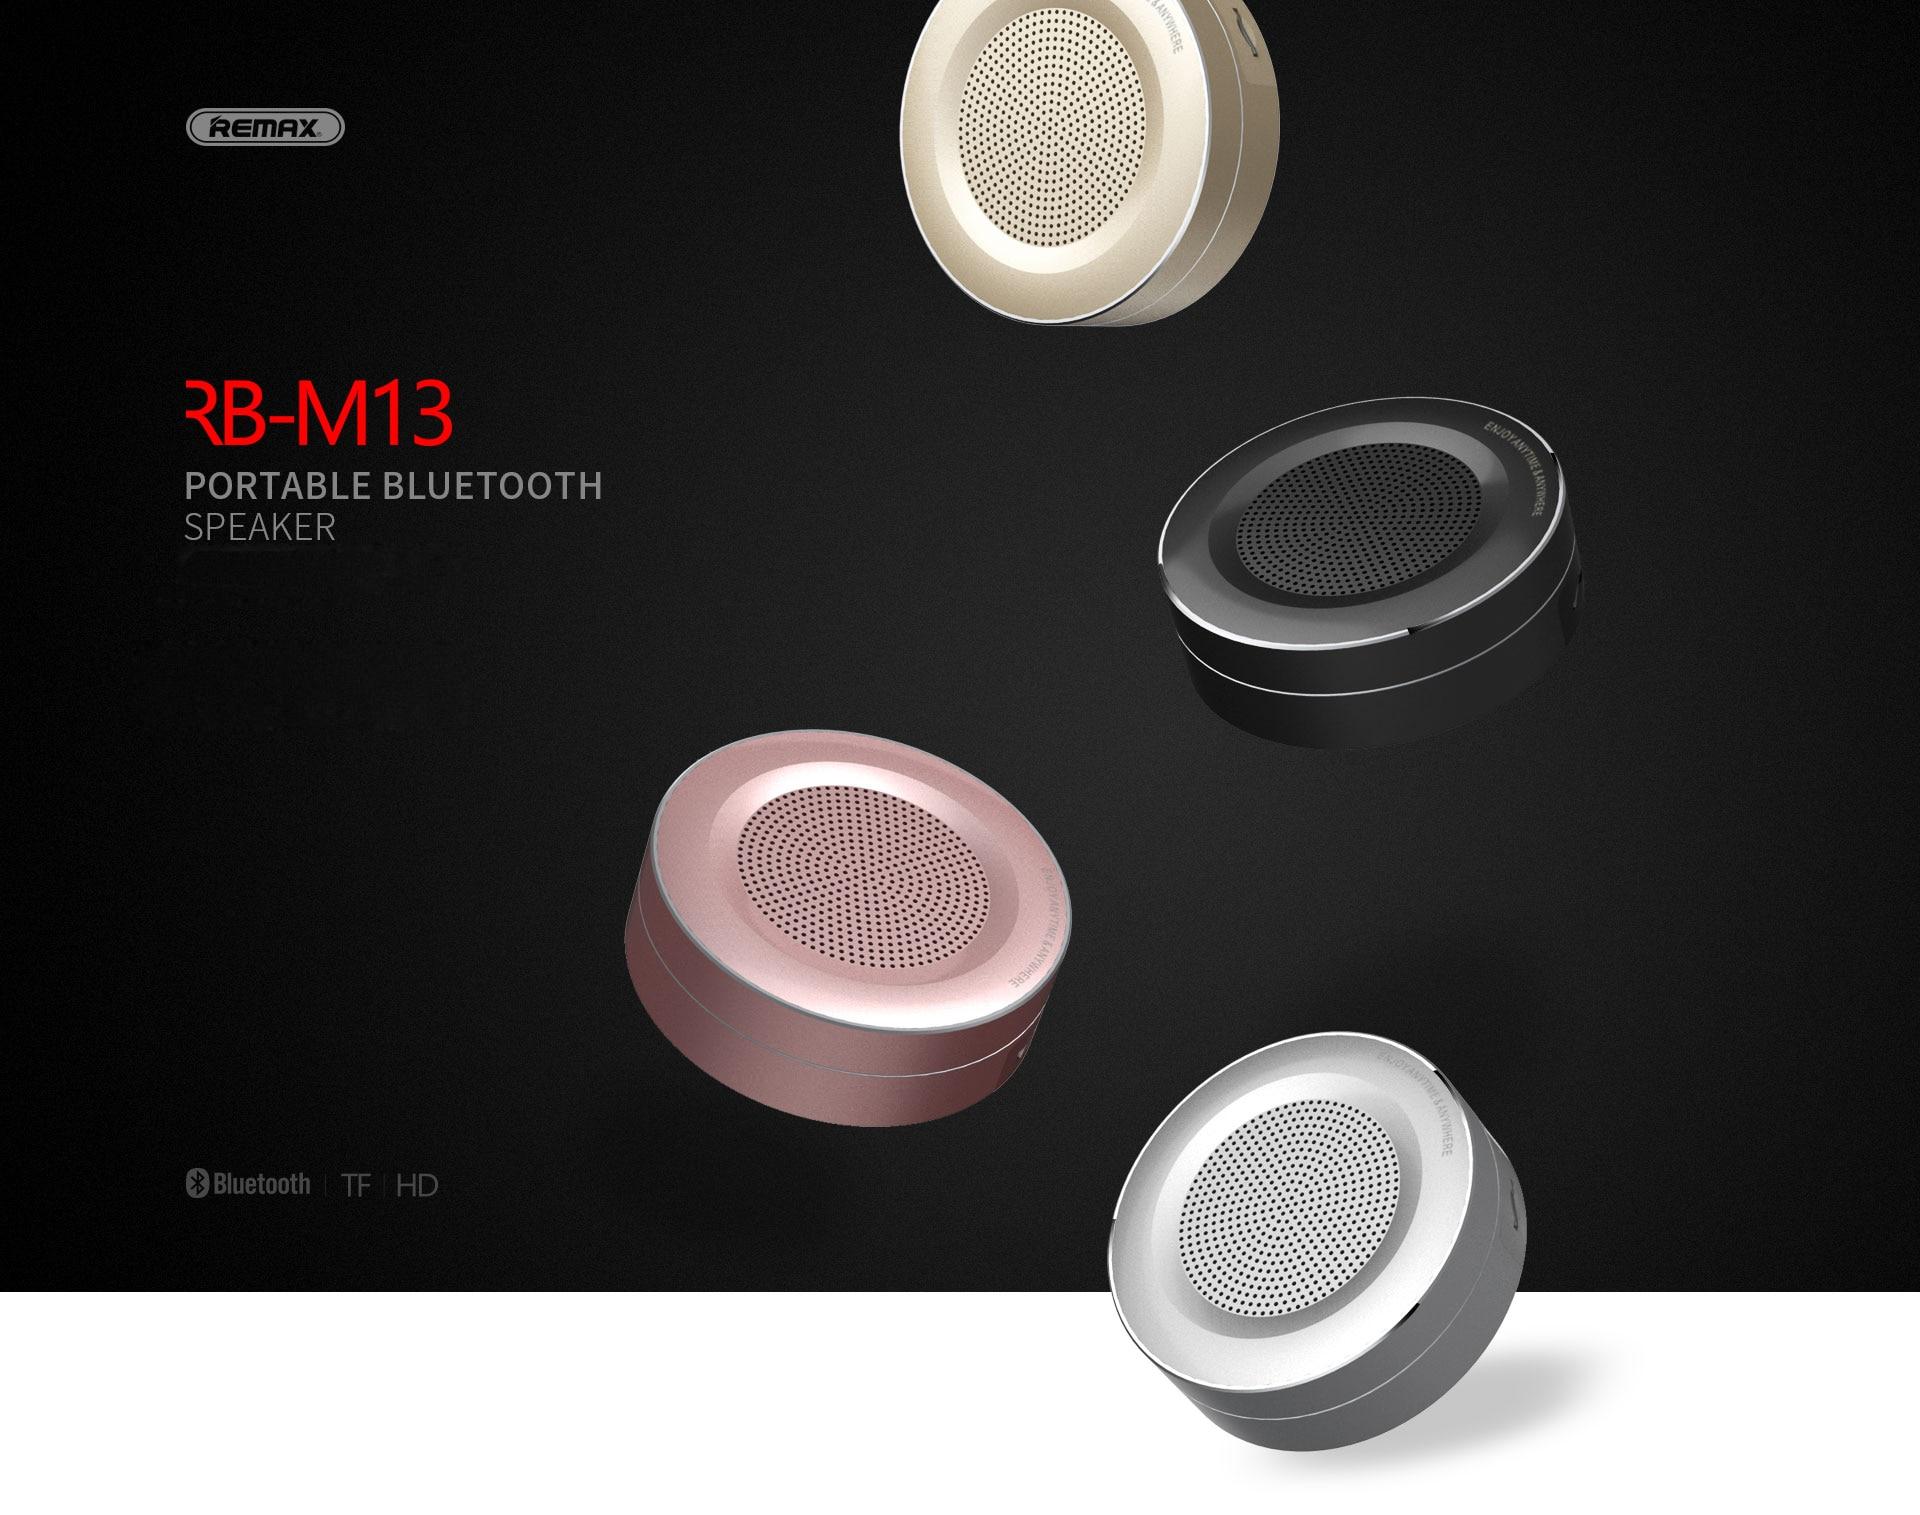 HTB1jaQKjKuSBuNjy1Xcq6AYjFXaZ Remax Bluetooth Portable Speaker RB-M13 - Black